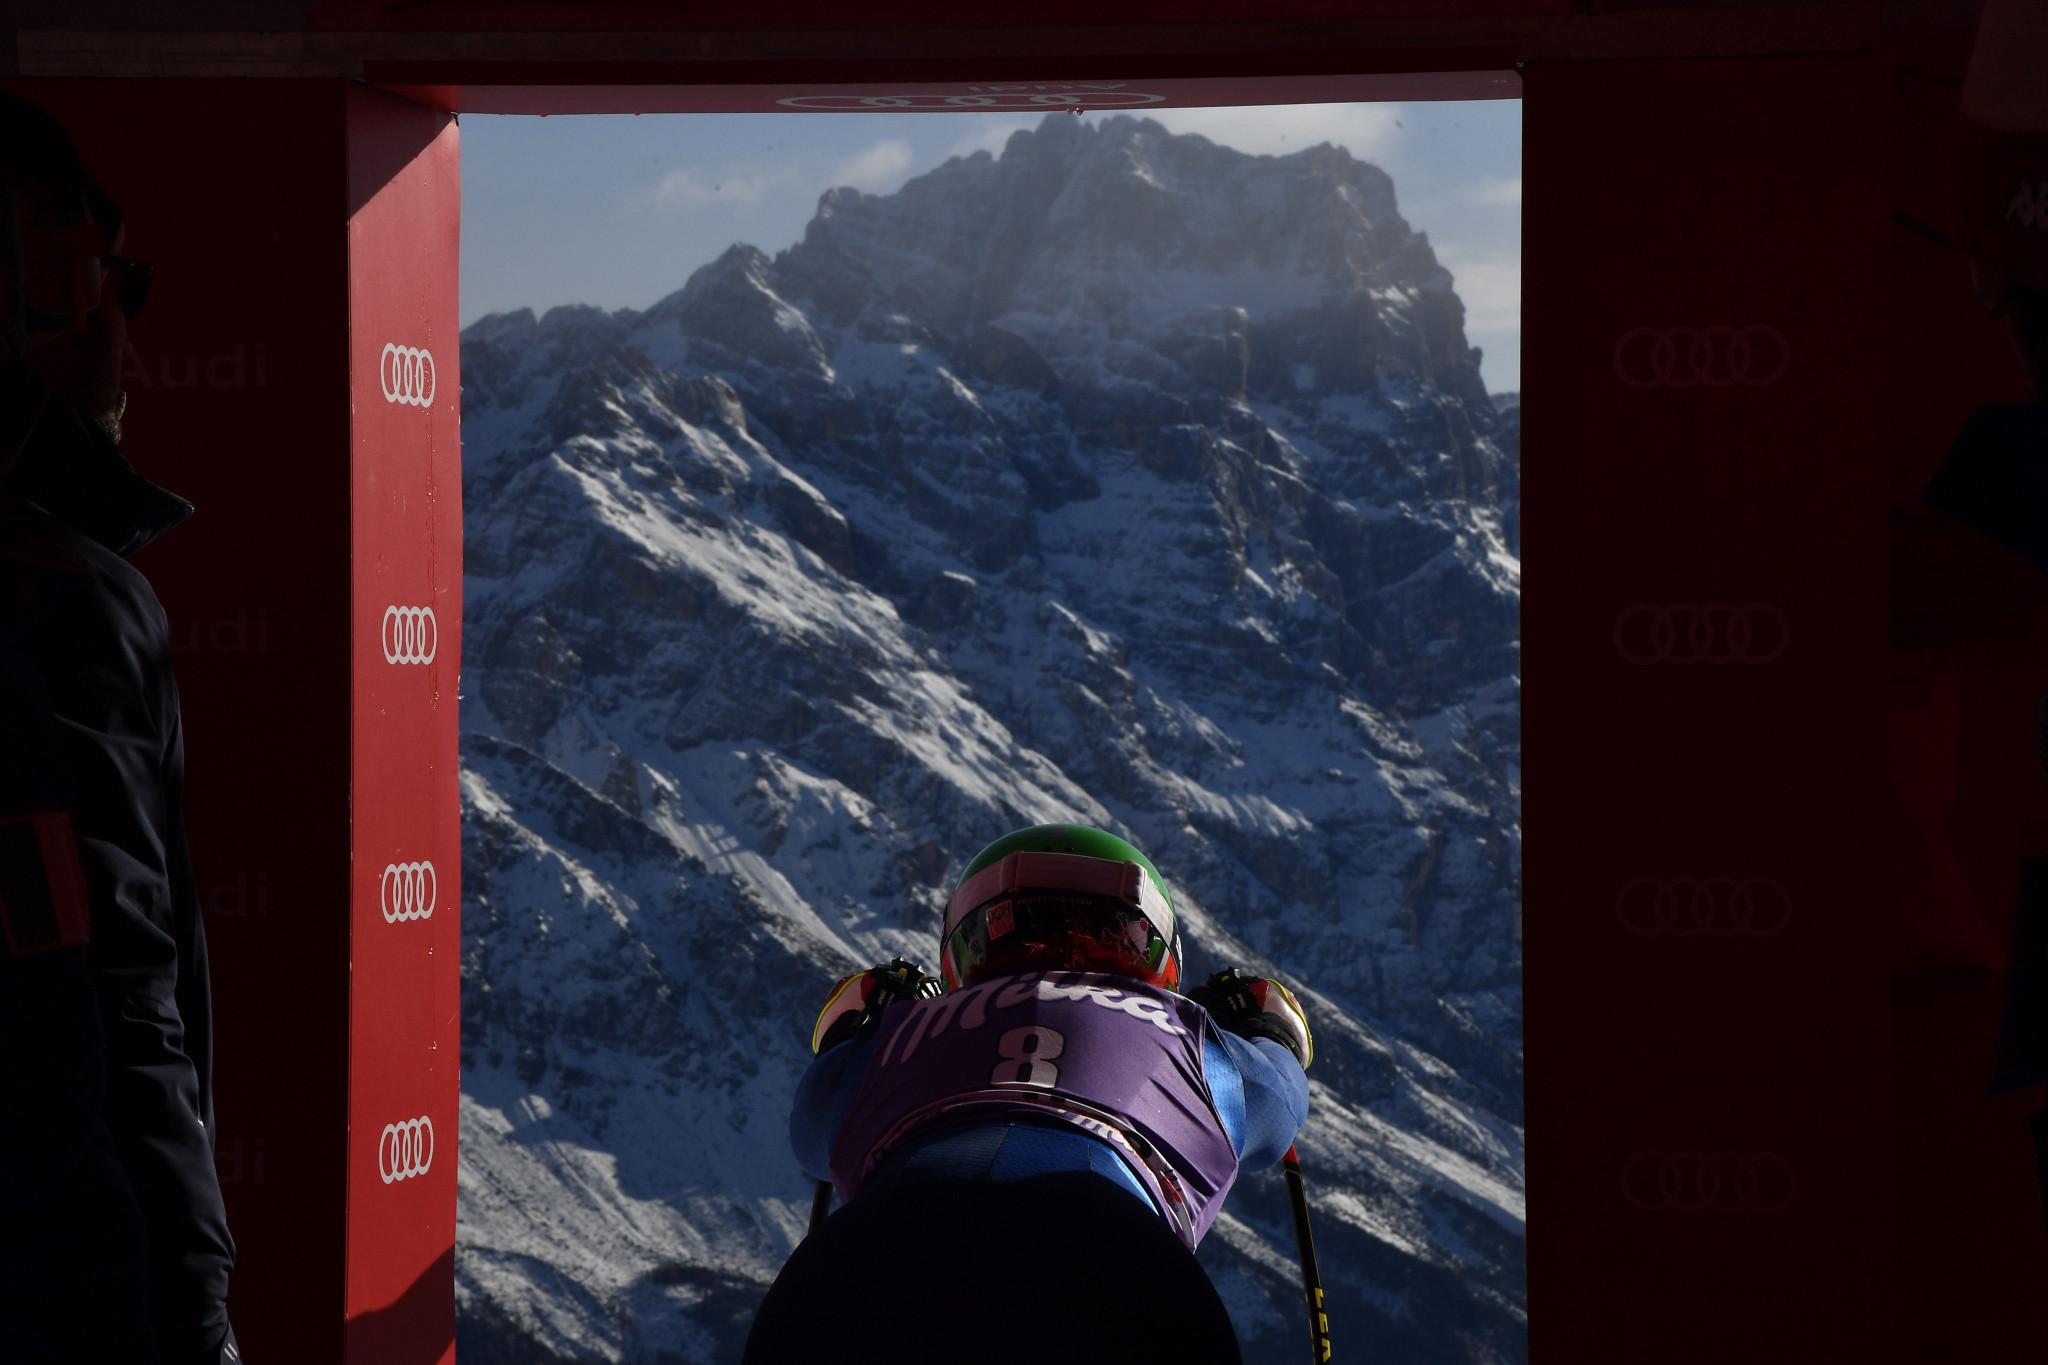 Cortina d'Ampezzo Alpine World Ski Championships to remain in 2021